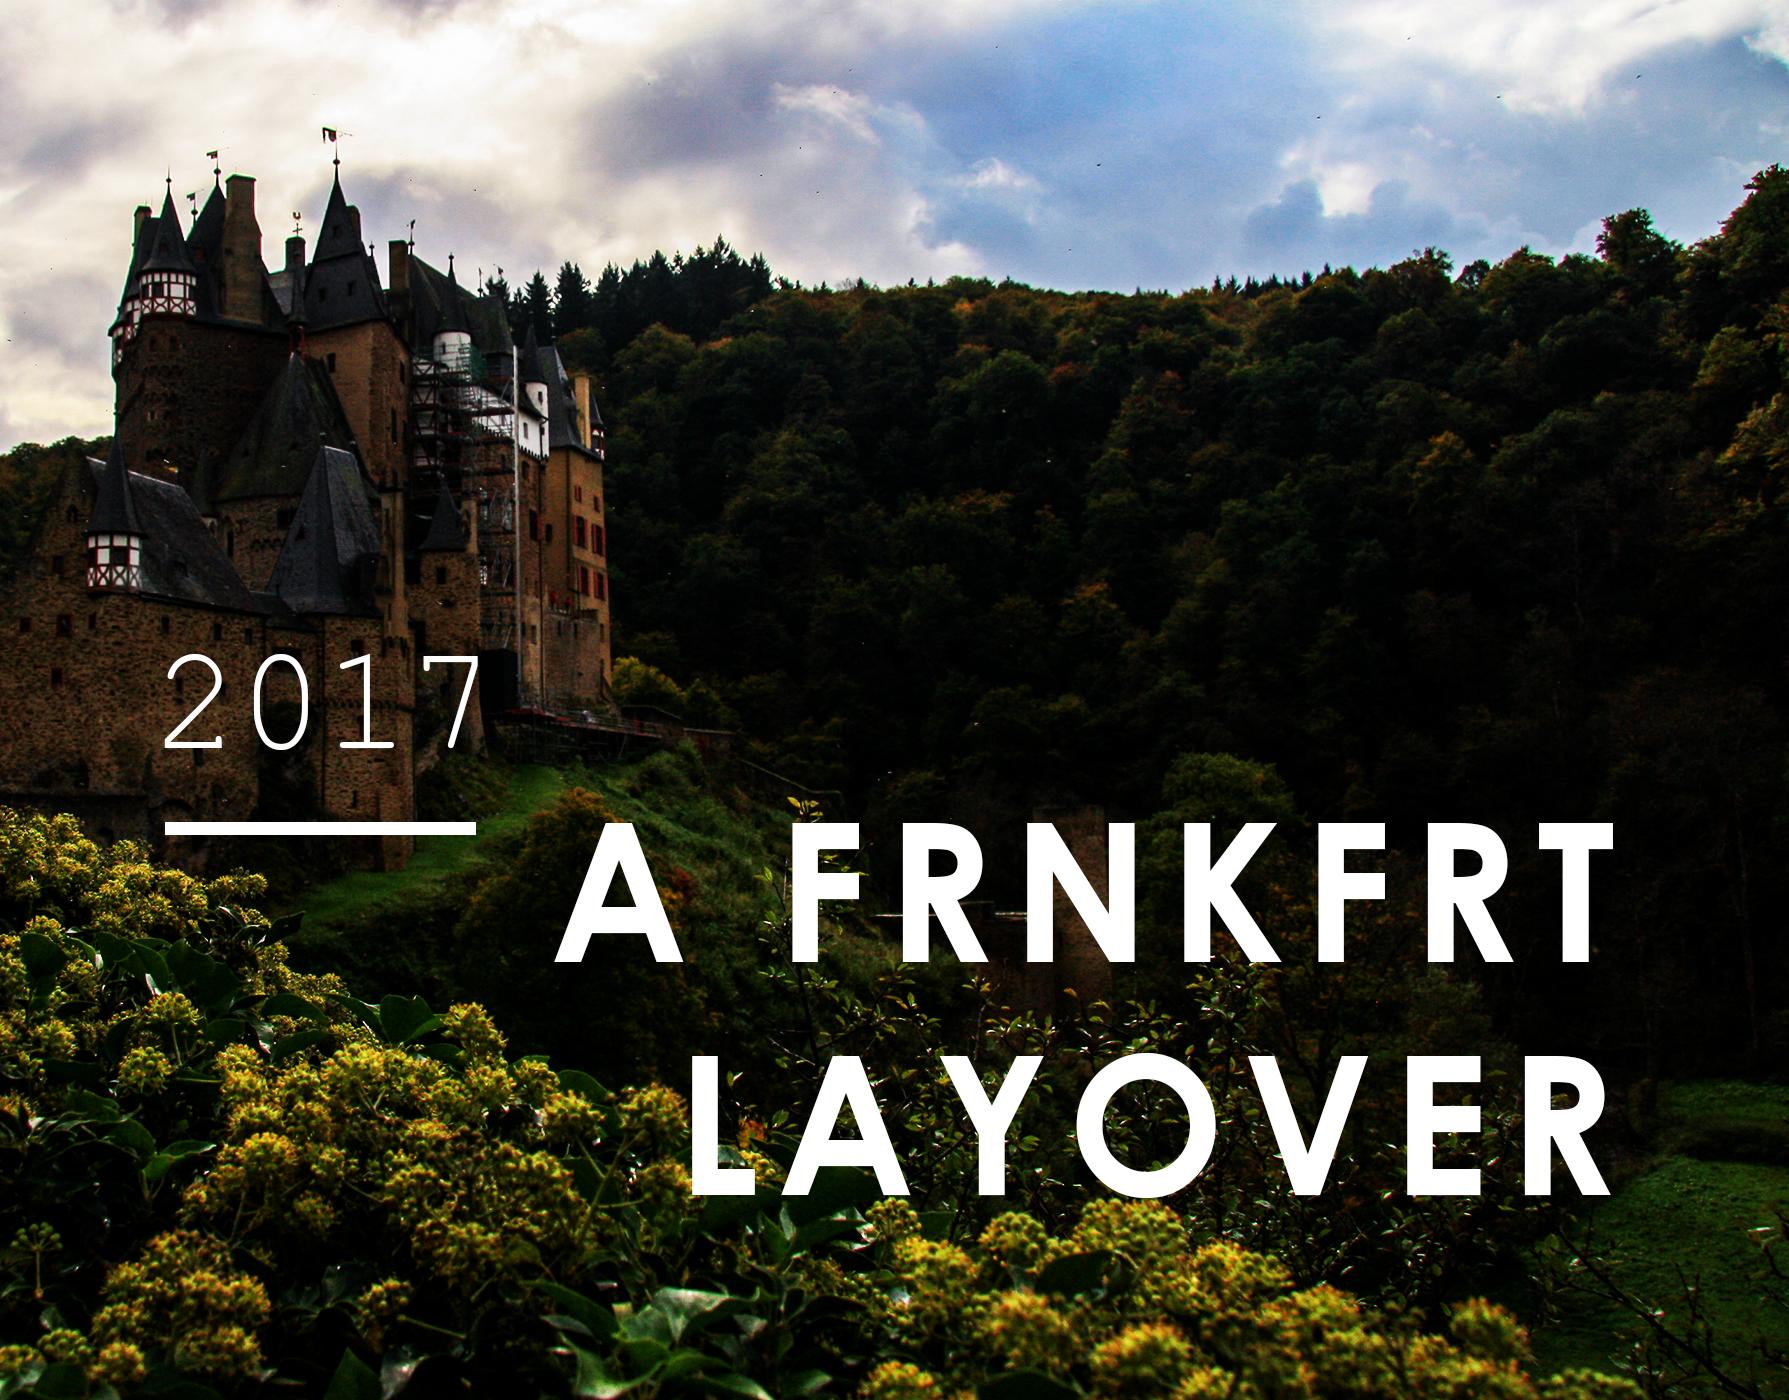 AFrnkfrtLayover2017_BehanceHeader_1000x.png